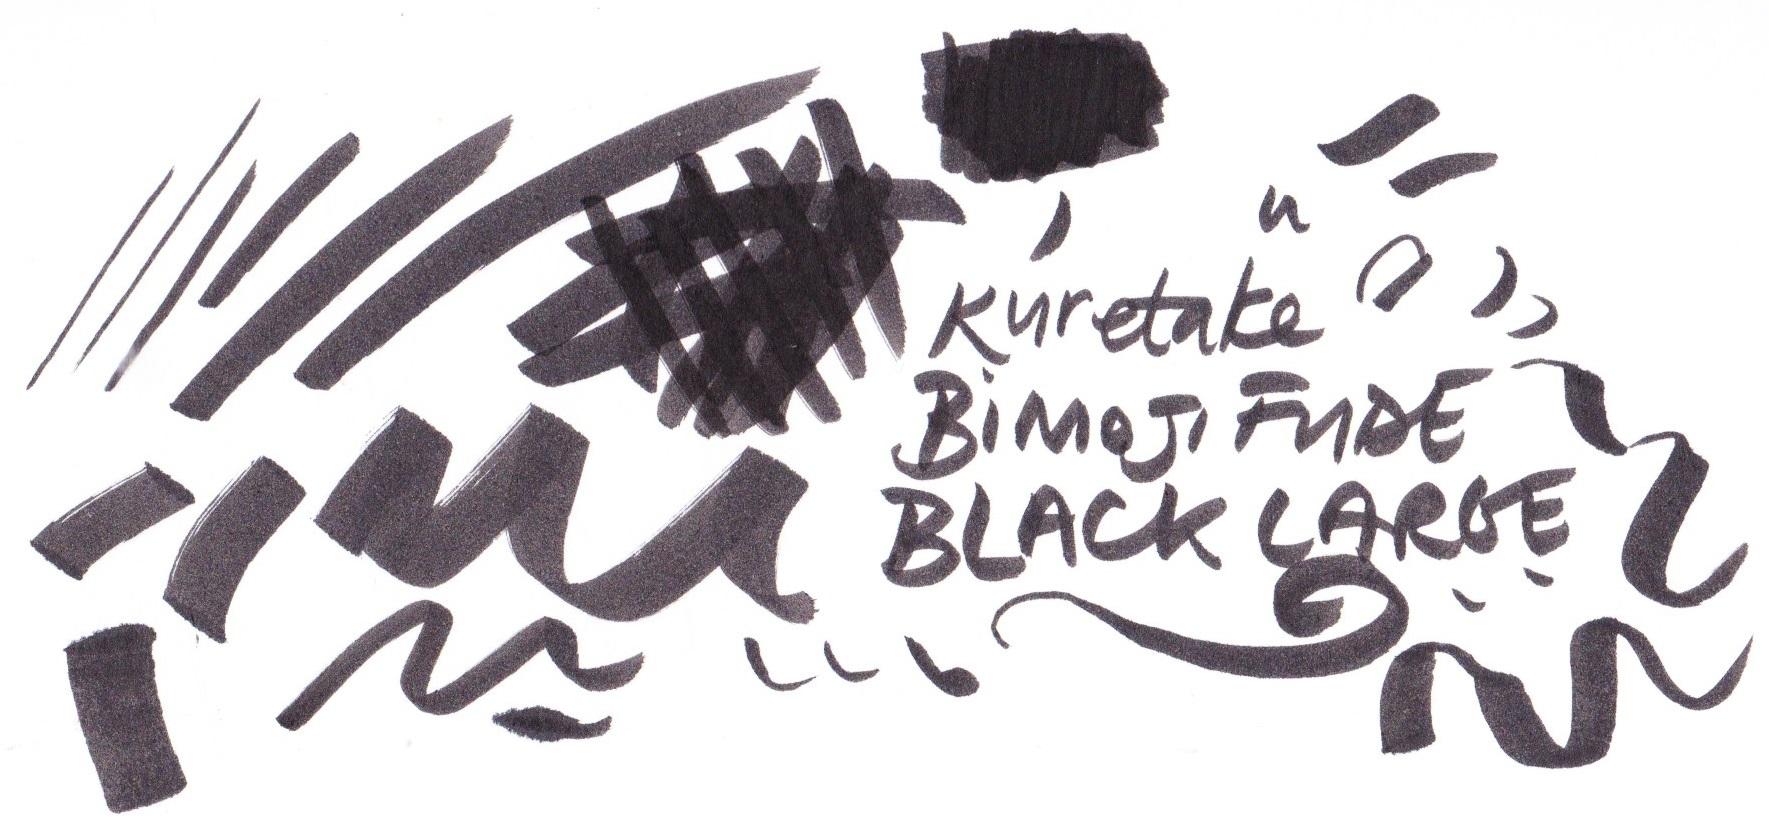 Kuretake Bimoji Fude large black pen on Bristol board